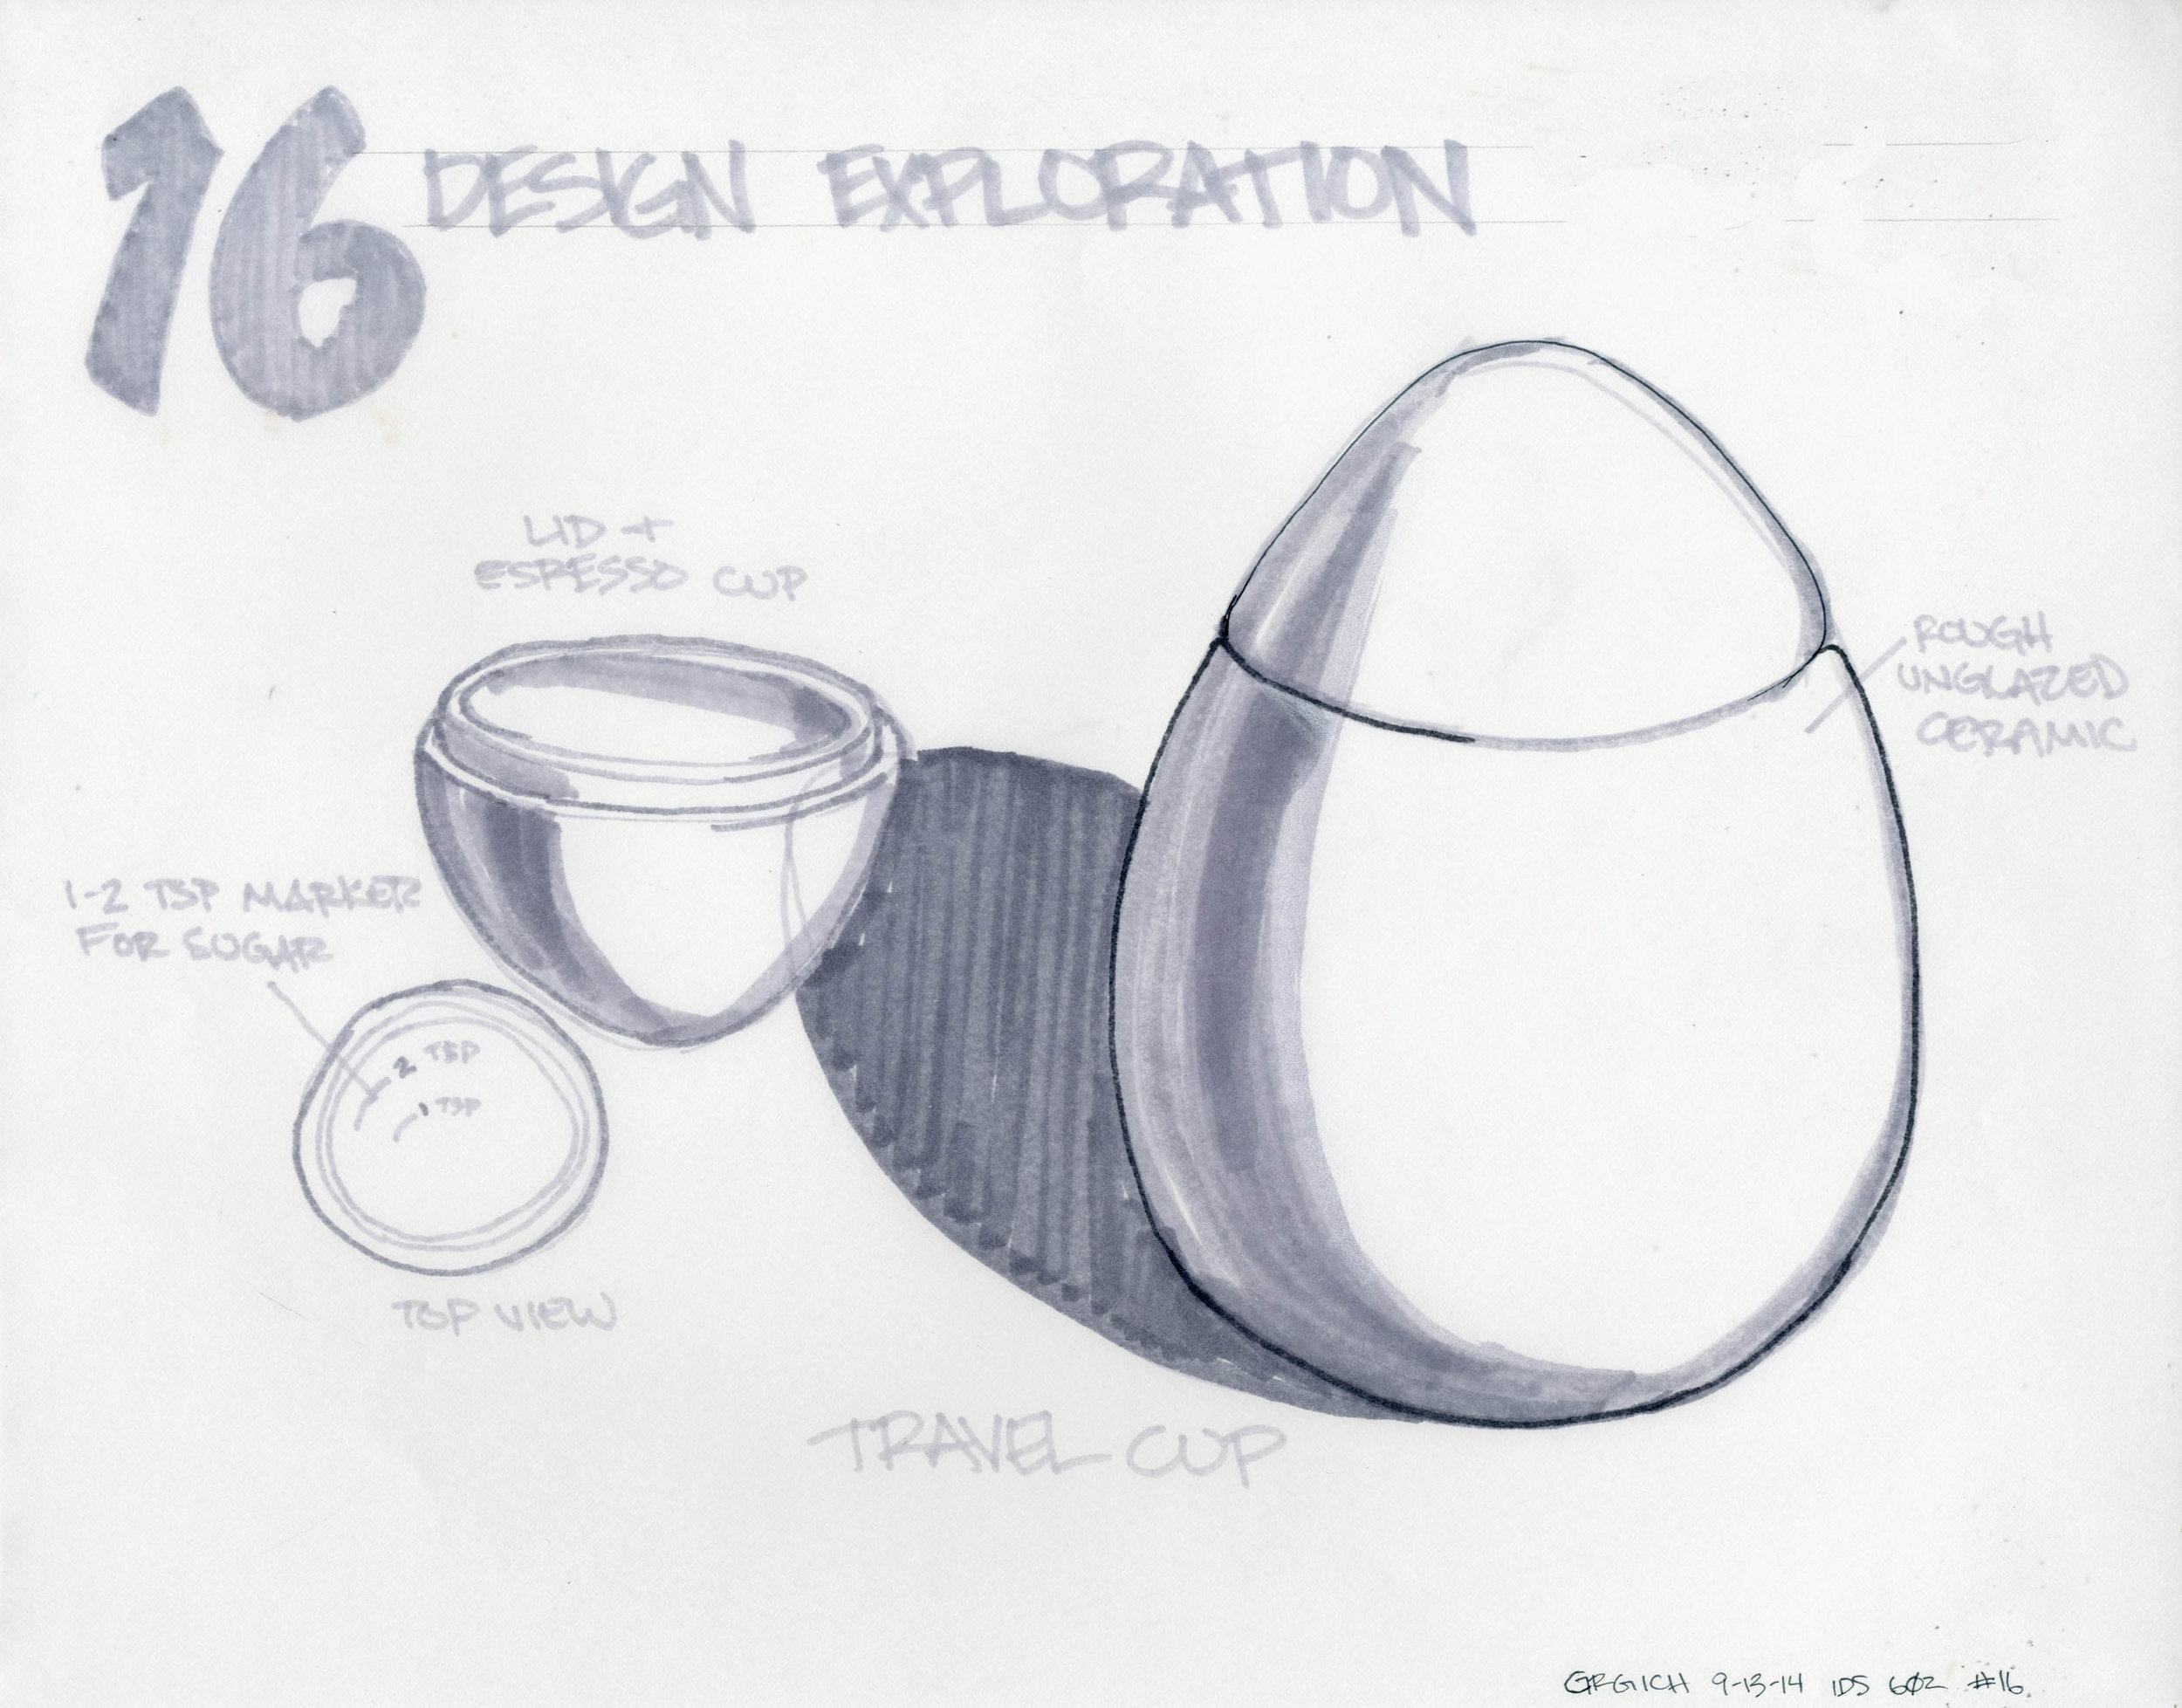 602_Grgich_Illy_Sketches016.jpg